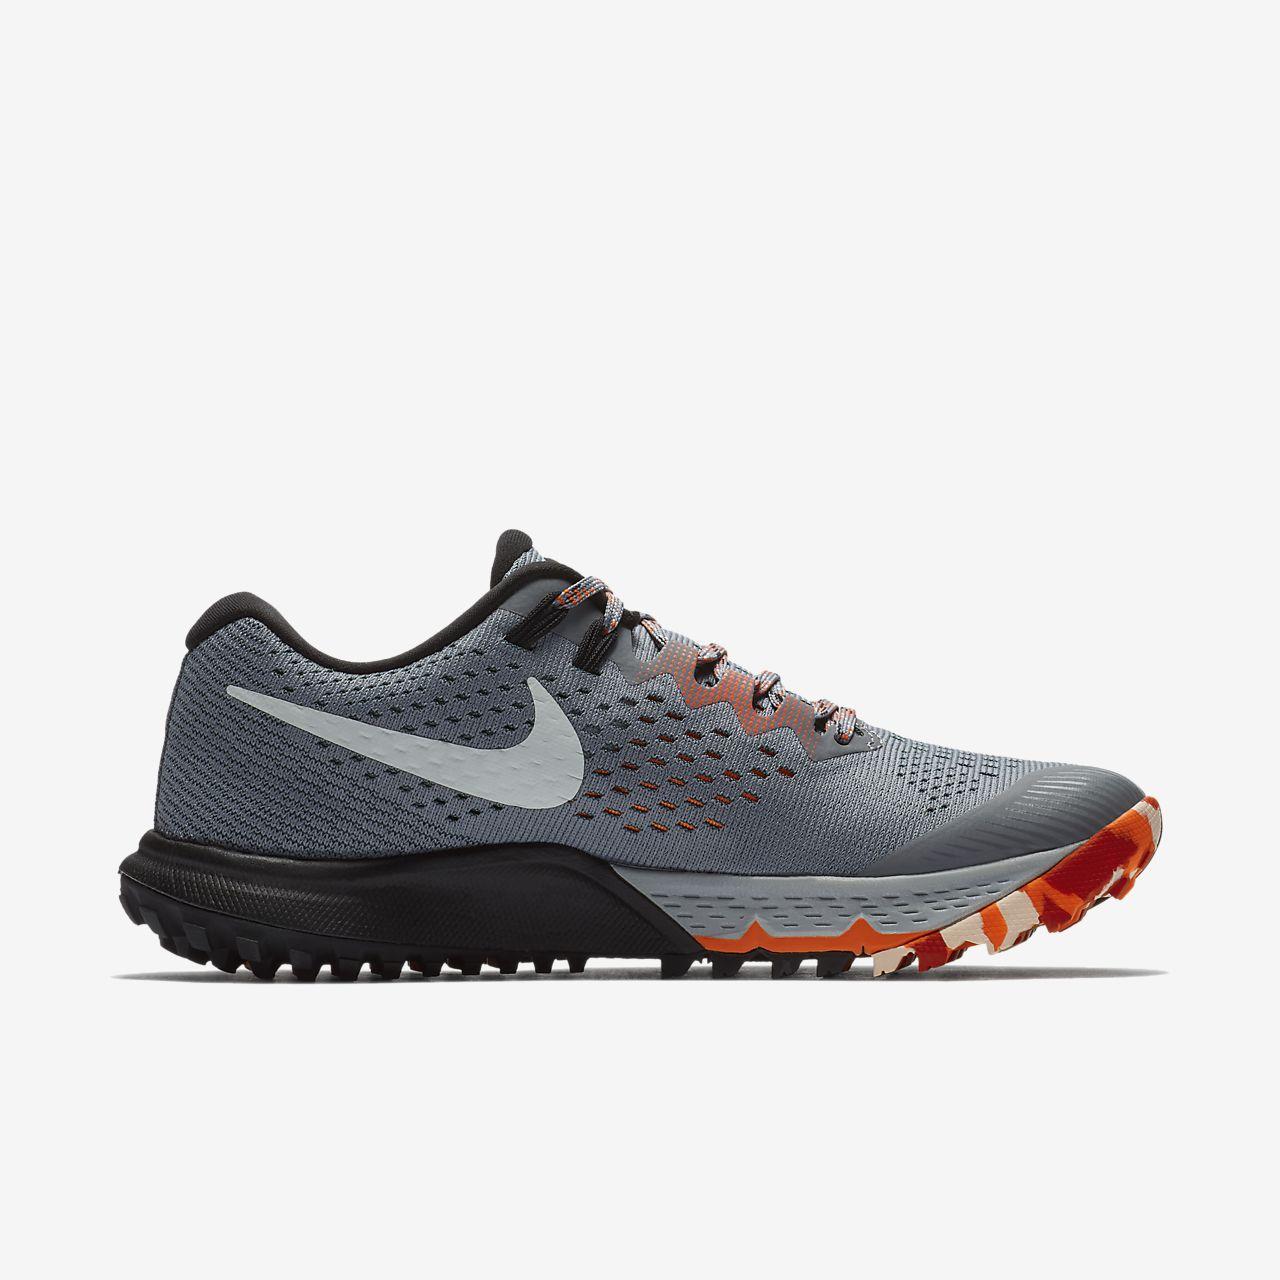 ... Nike Air Zoom Terra Kiger 4 Damen-Laufschuh